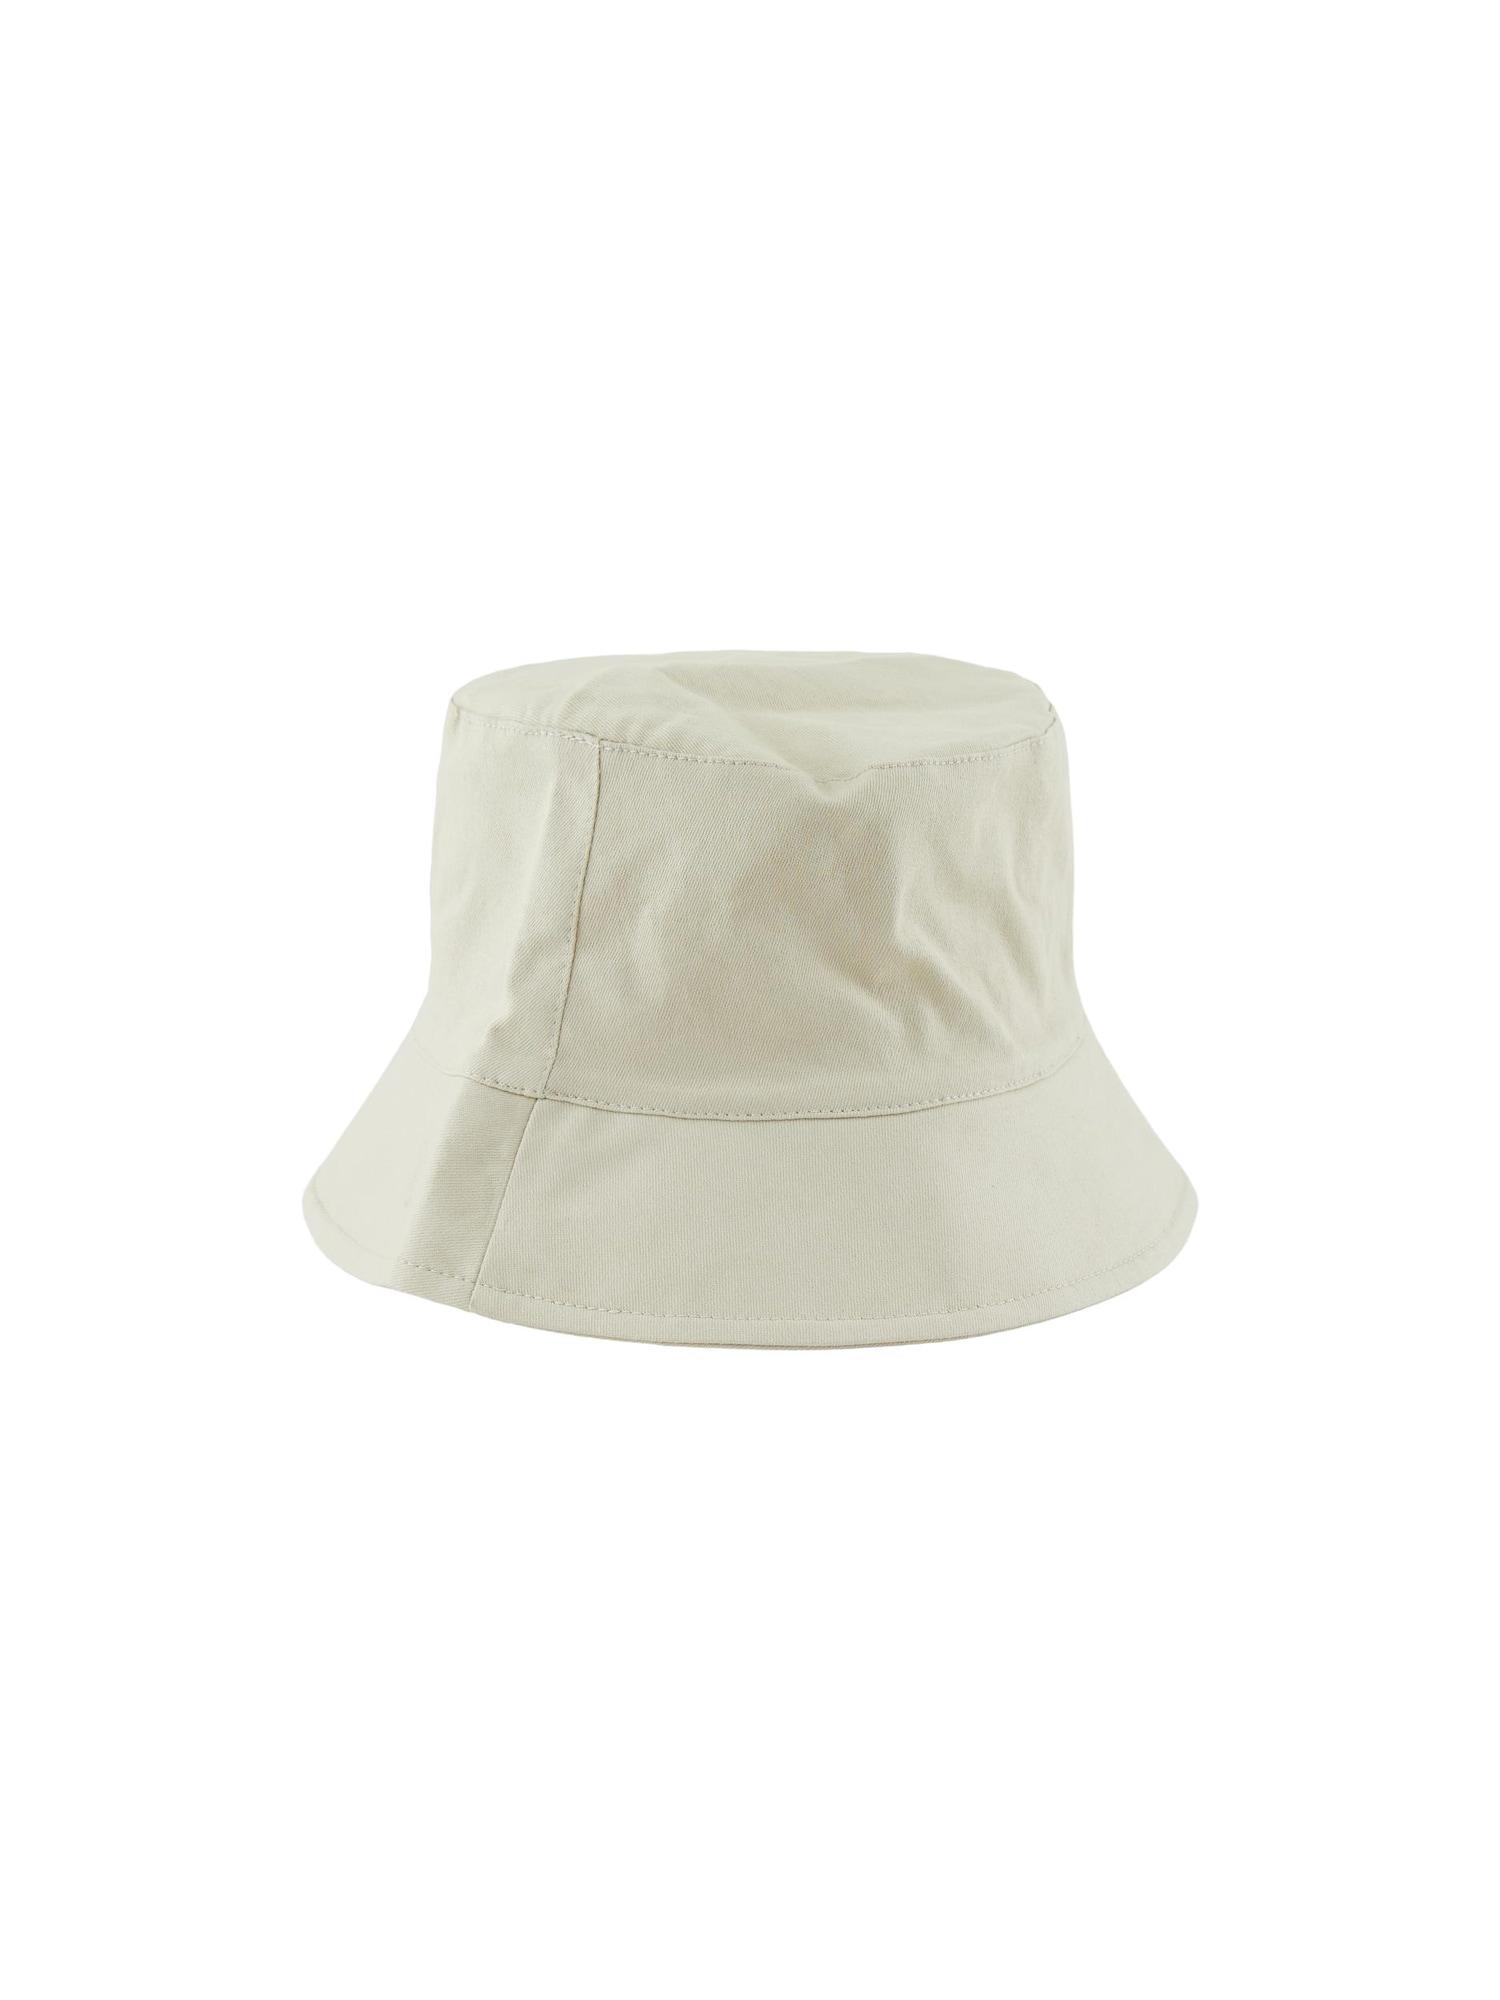 PIECES Skrybėlaitė balta